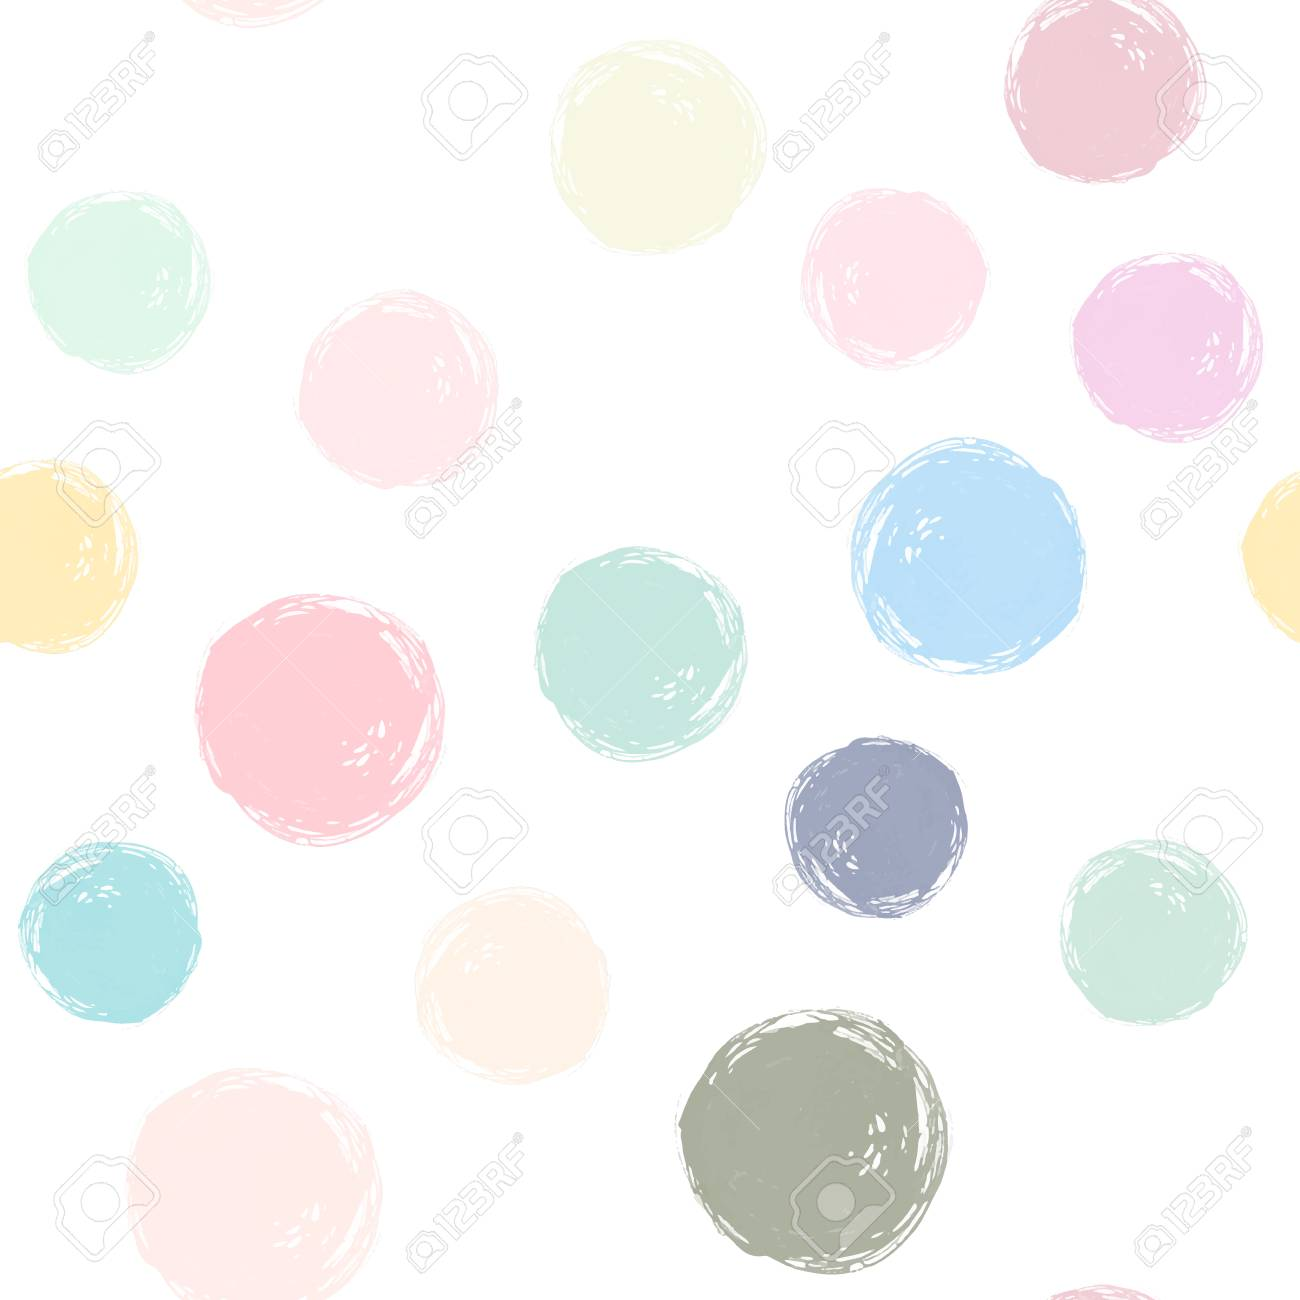 A Vector Watercolor Circles Seamless Pattern Pastel Watercolor Royalty Free Cliparts Vectors And Stock Illustration Image 90226266